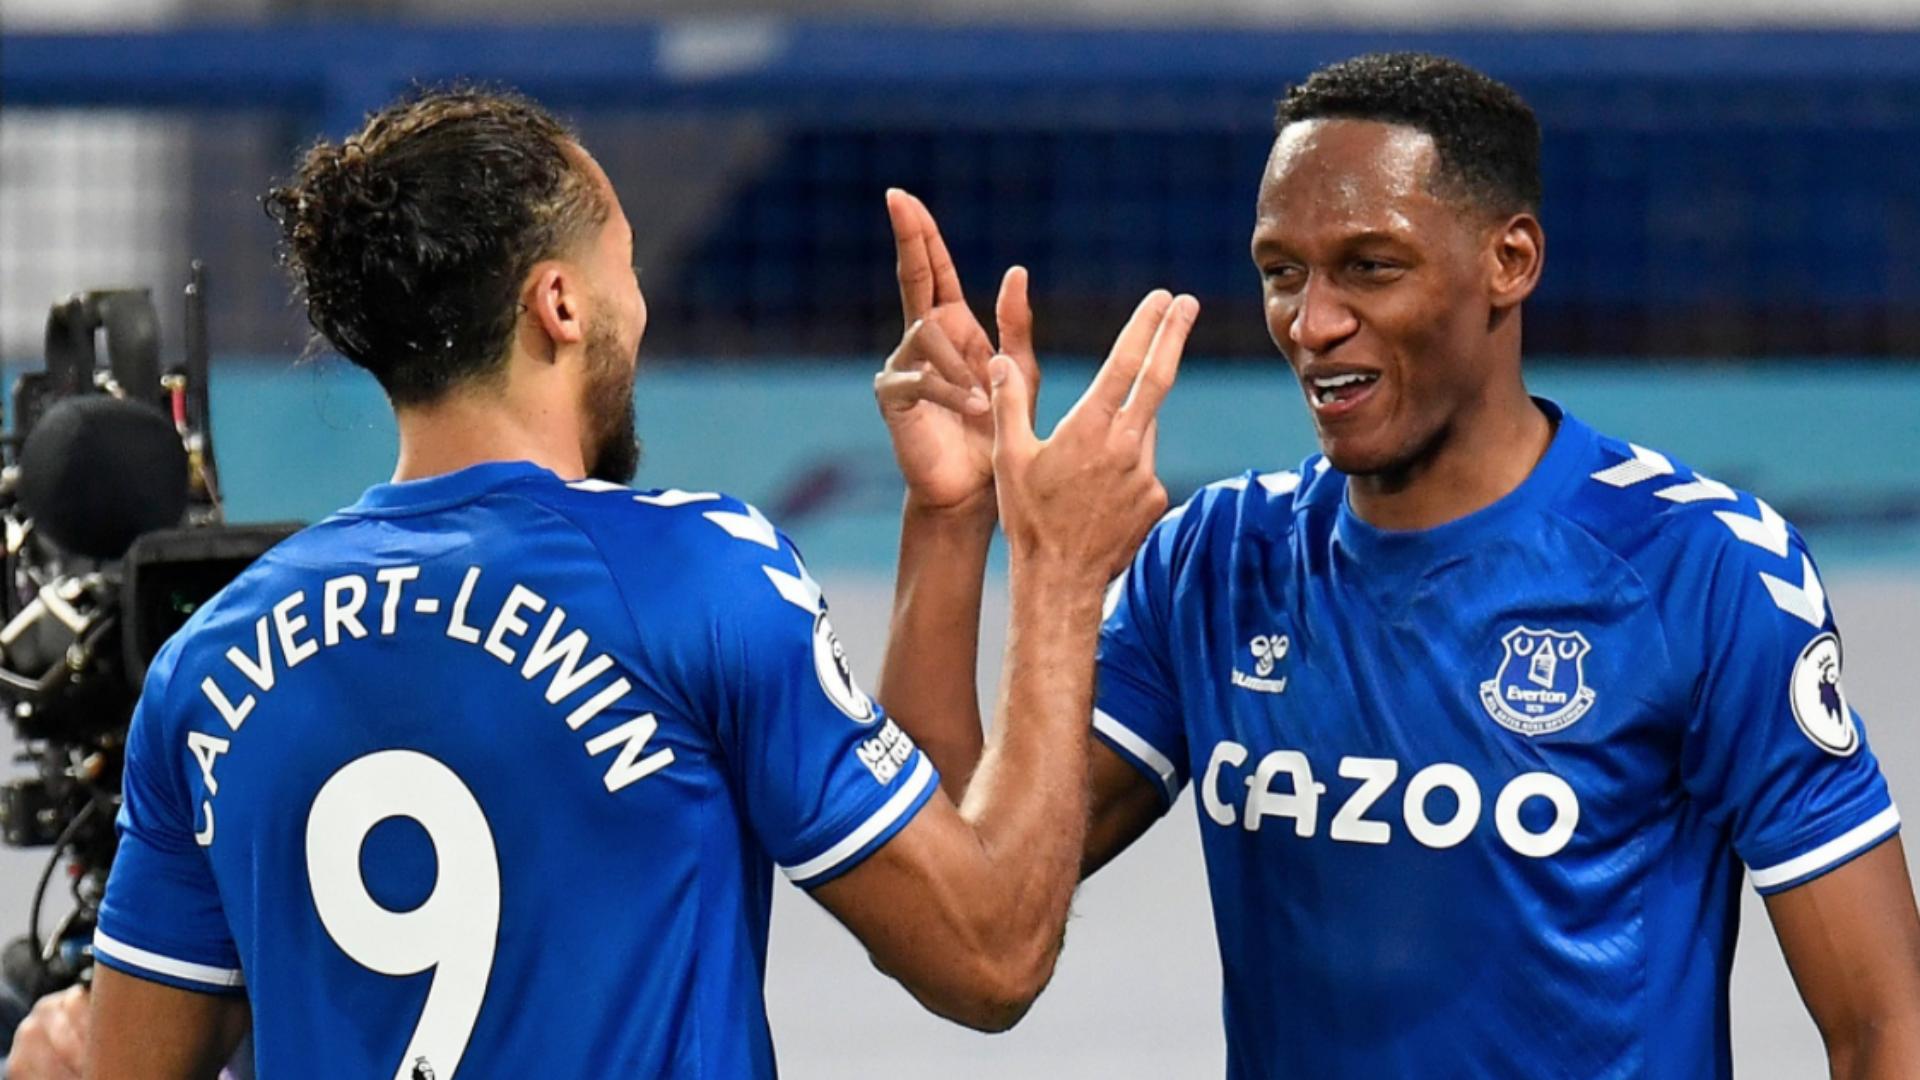 Everton 2-1 Arsenal: Pressure mounts on Arteta as Toffees move second